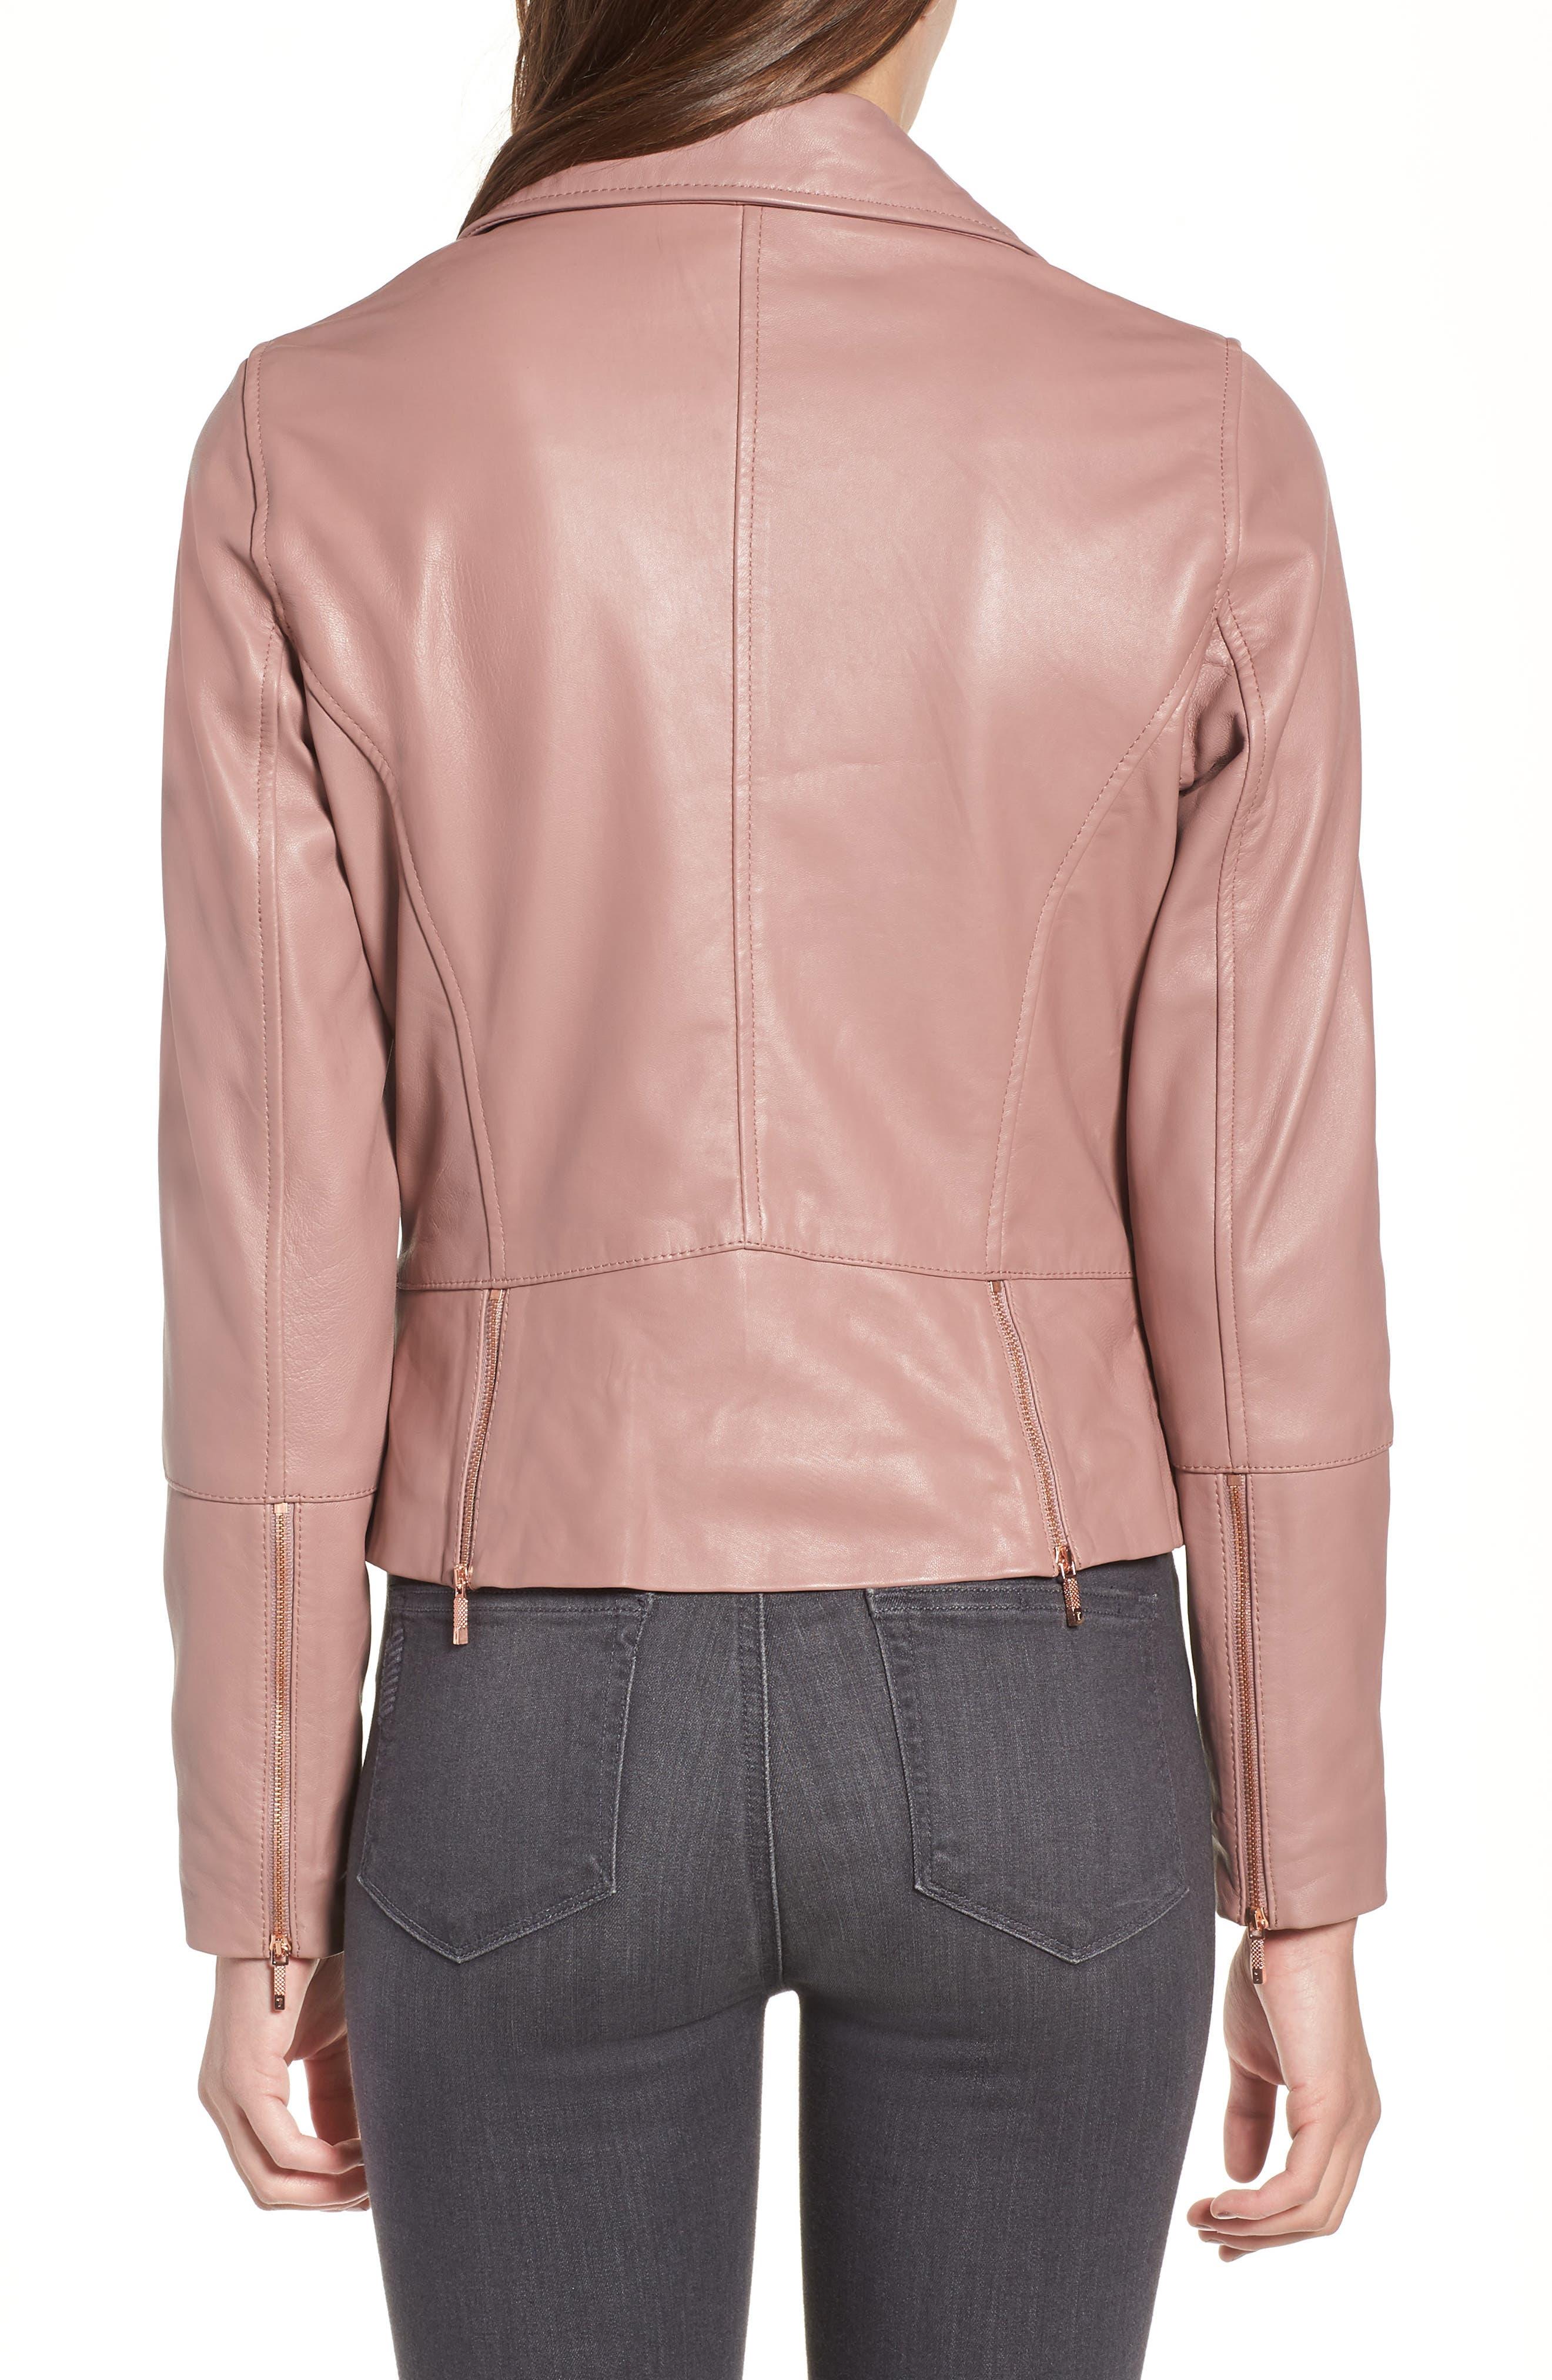 Lizia Leather Biker Jacket,                             Alternate thumbnail 2, color,                             Dusky Pink